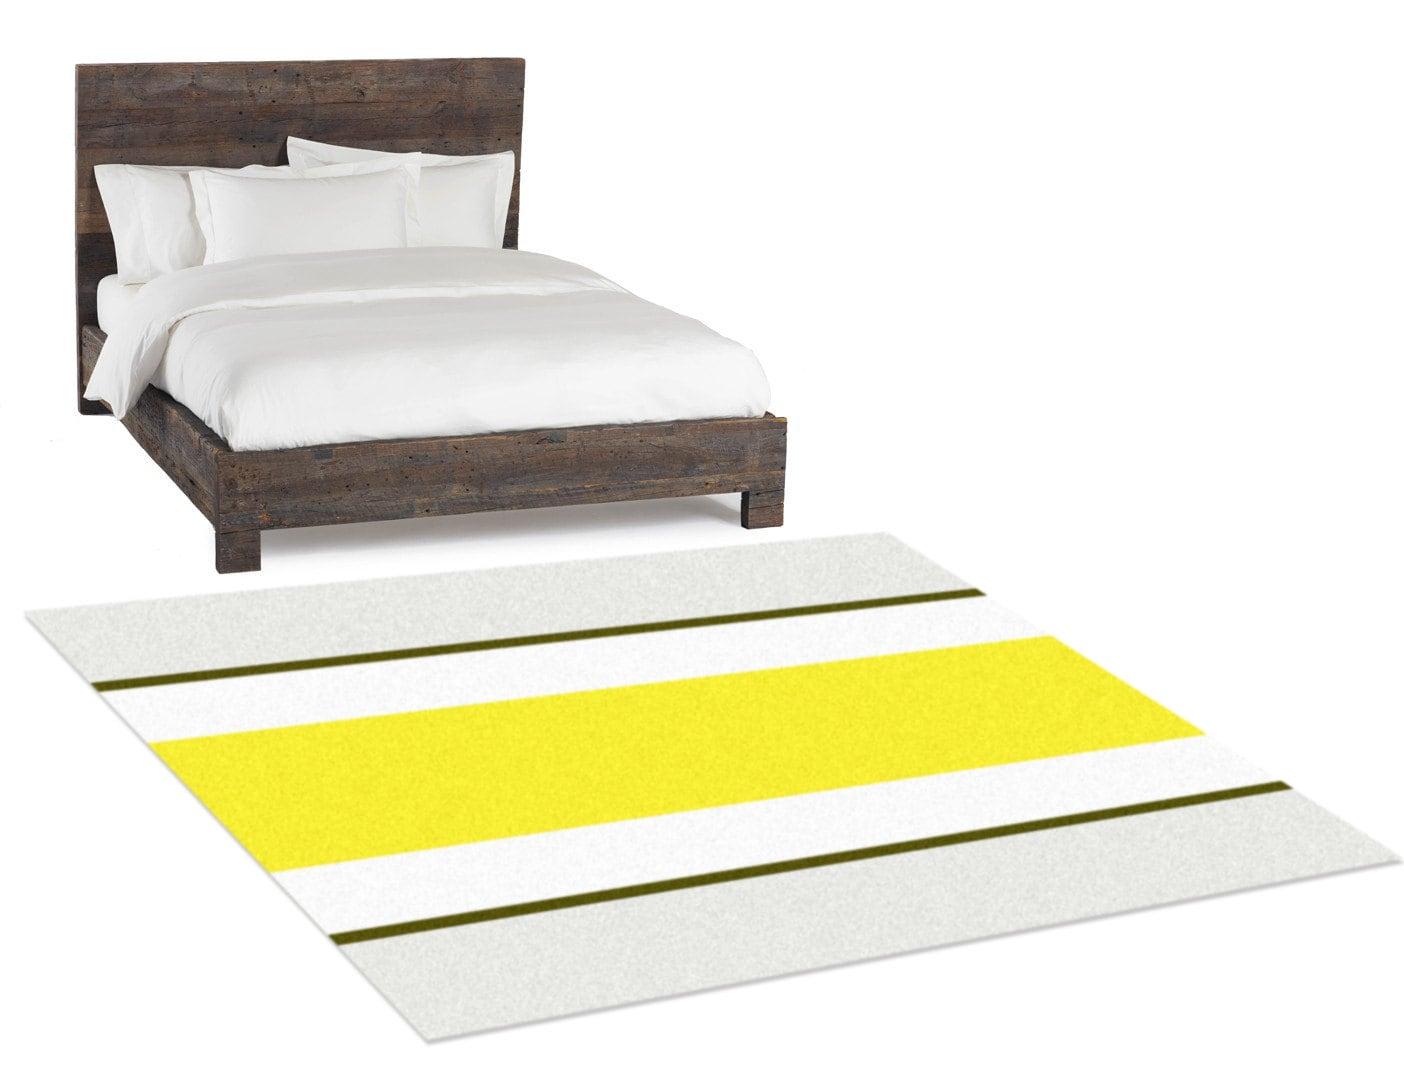 Bedside Rug Area Rug Yellow Rug Bedroom Rug By Hawkerpeddler